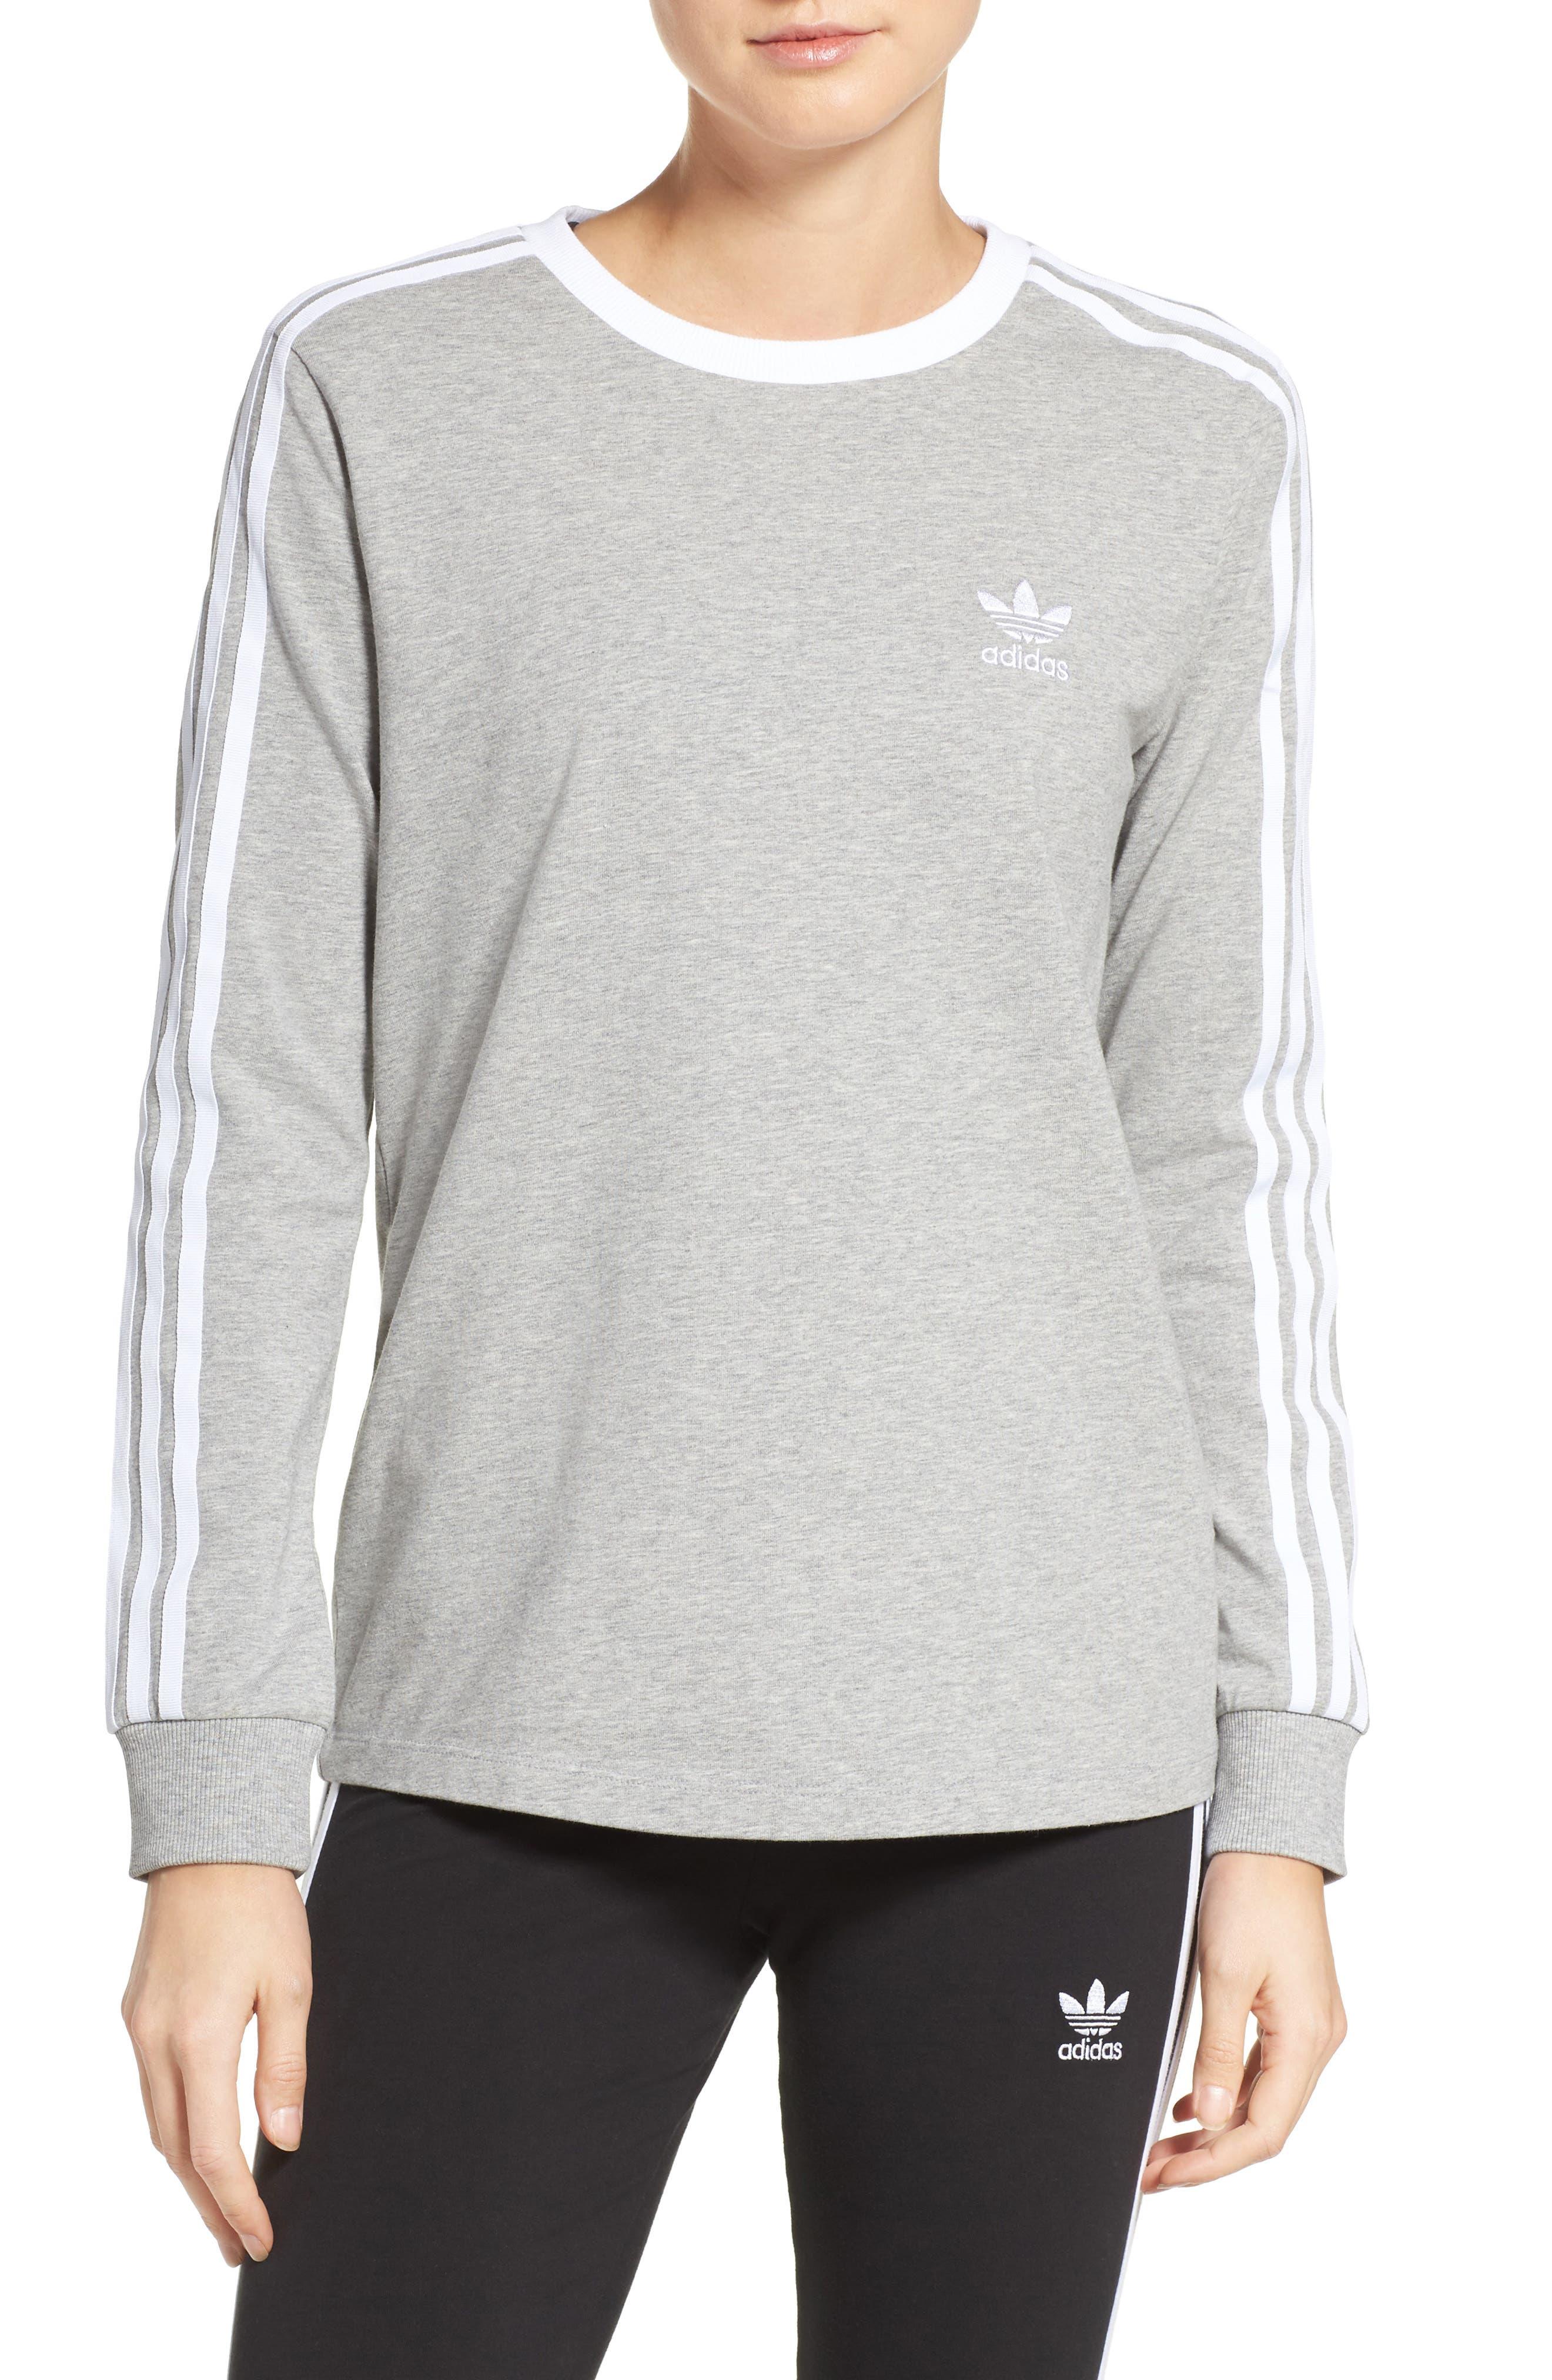 Alternate Image 1 Selected - adidas Originals Jersey Tee